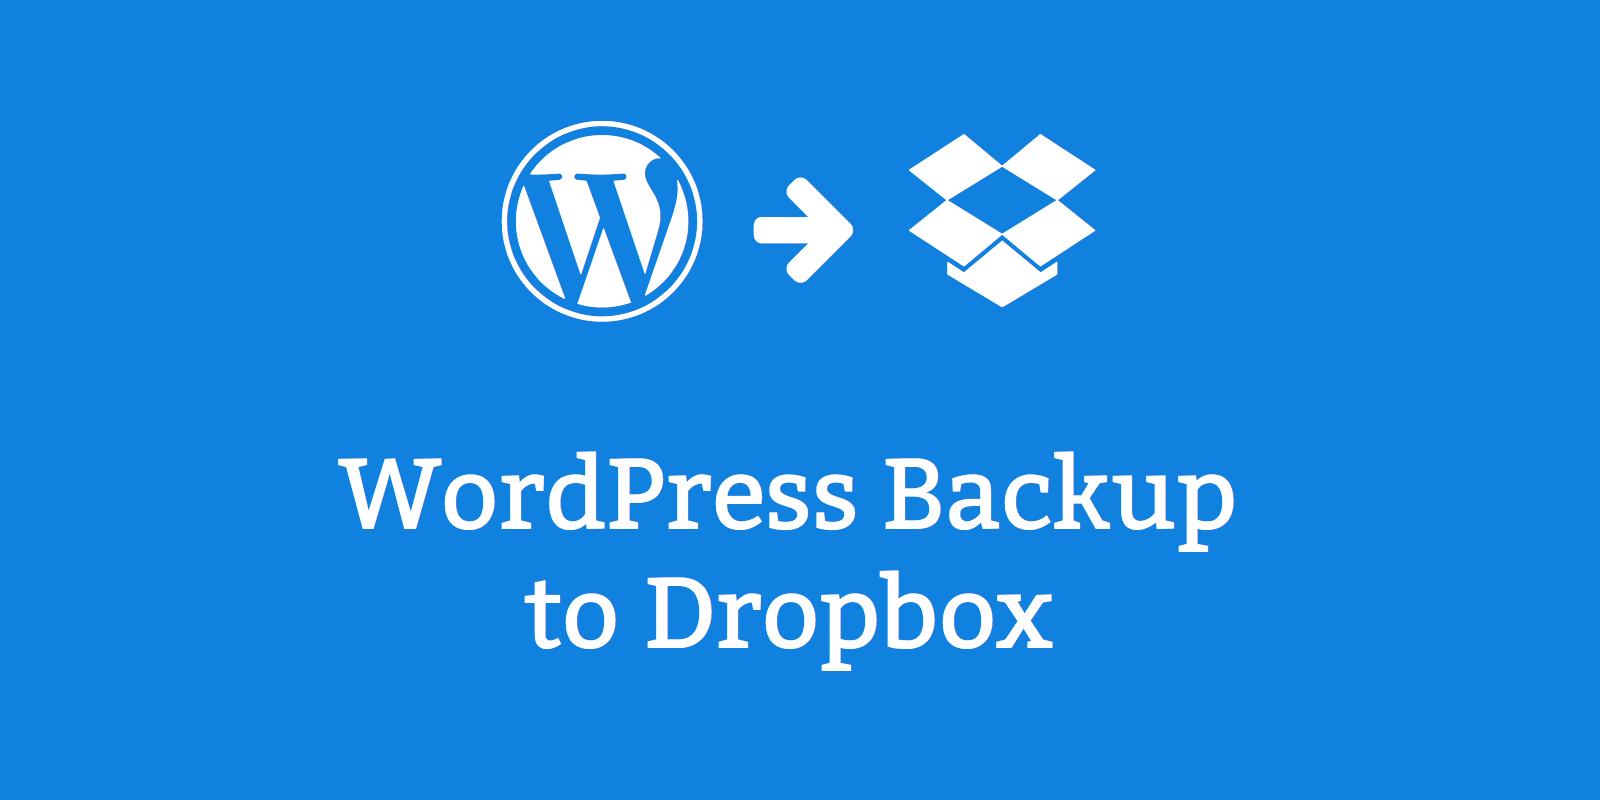 WordPress Backup to Dropbox плагин для качественного бэкапа сайта